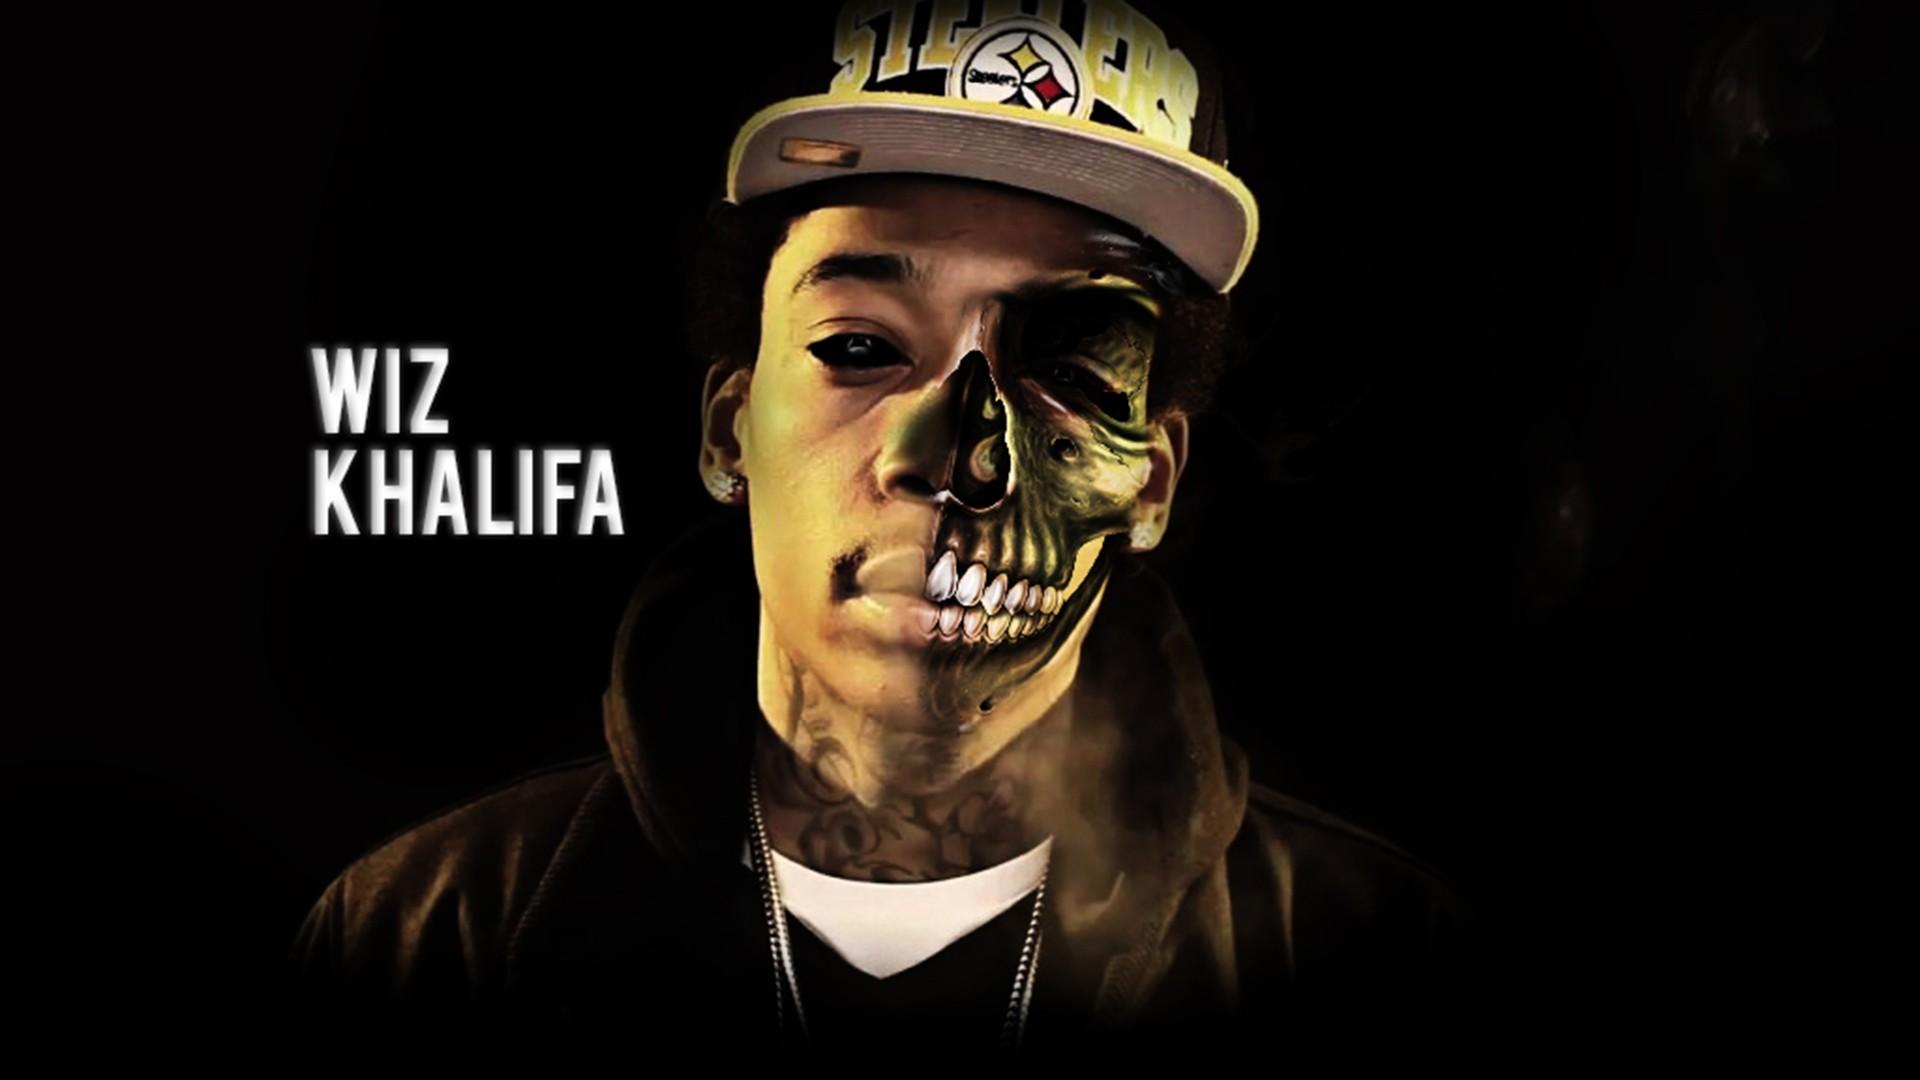 Wiz Khalifa Half Zombie Face Rap Wallpapers 1920x1080